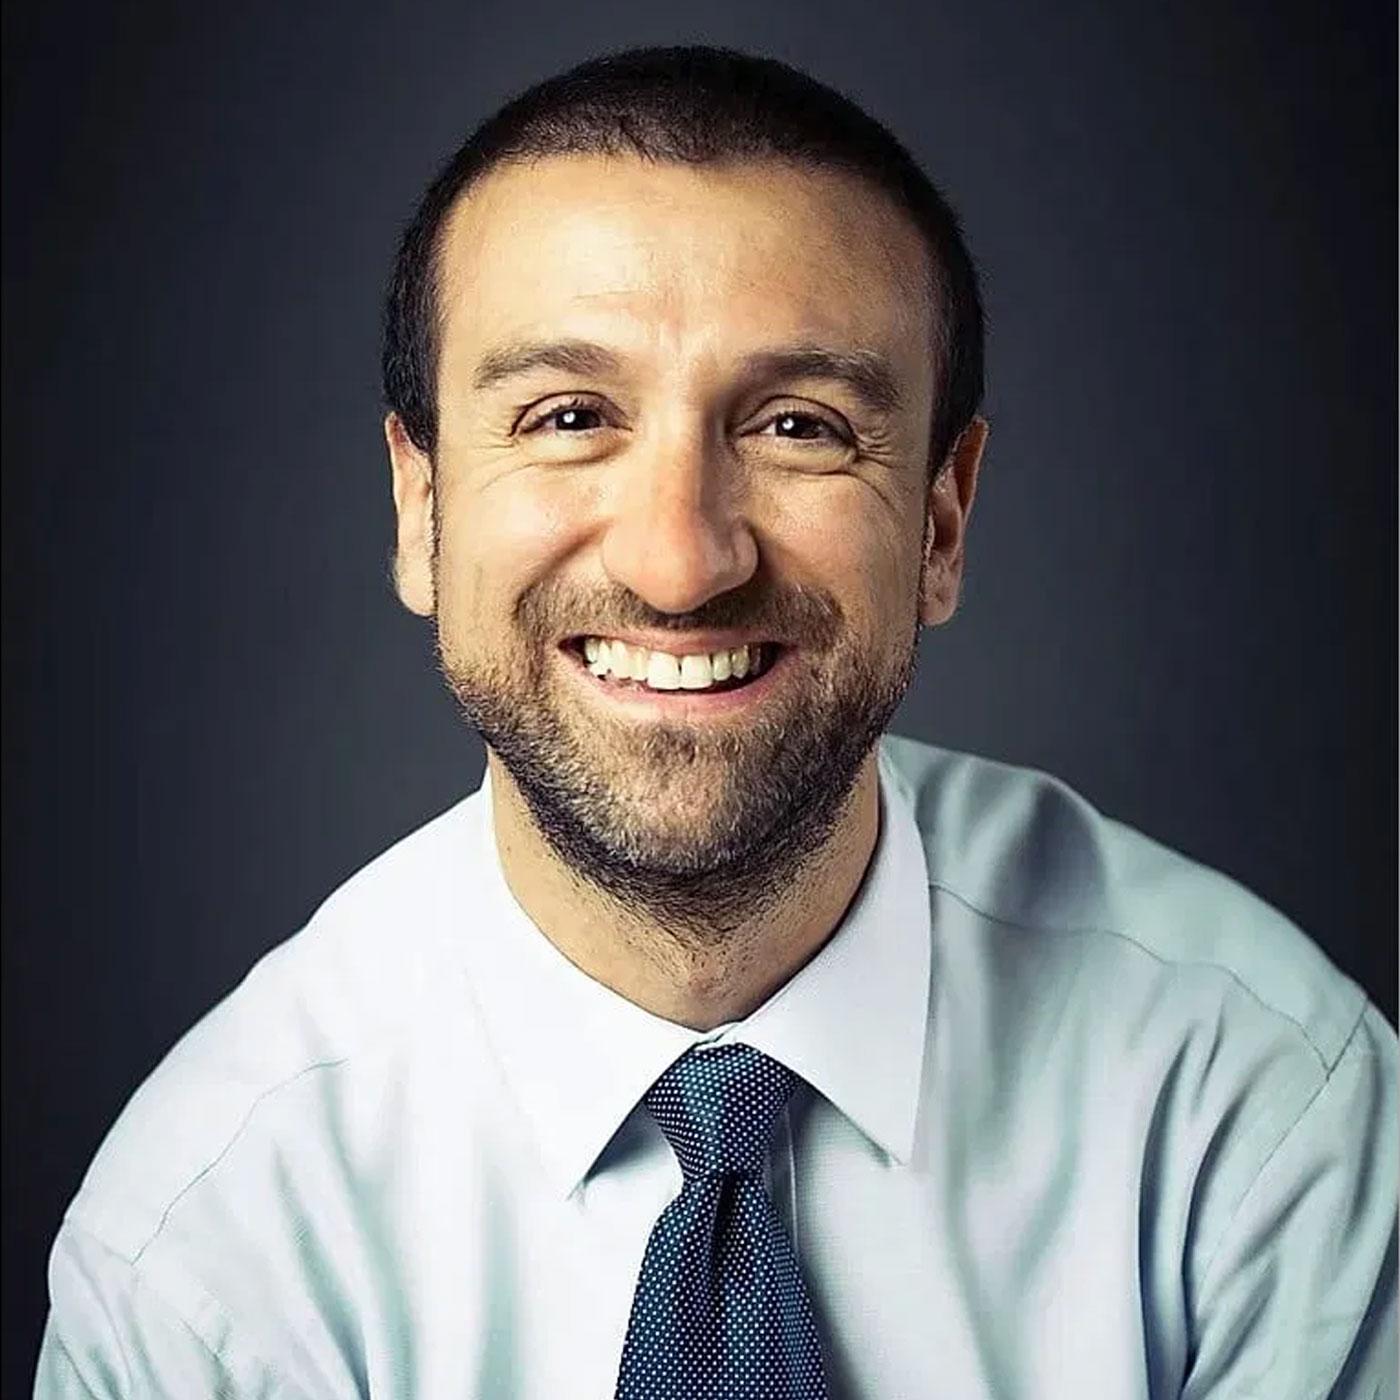 Stefano Manera